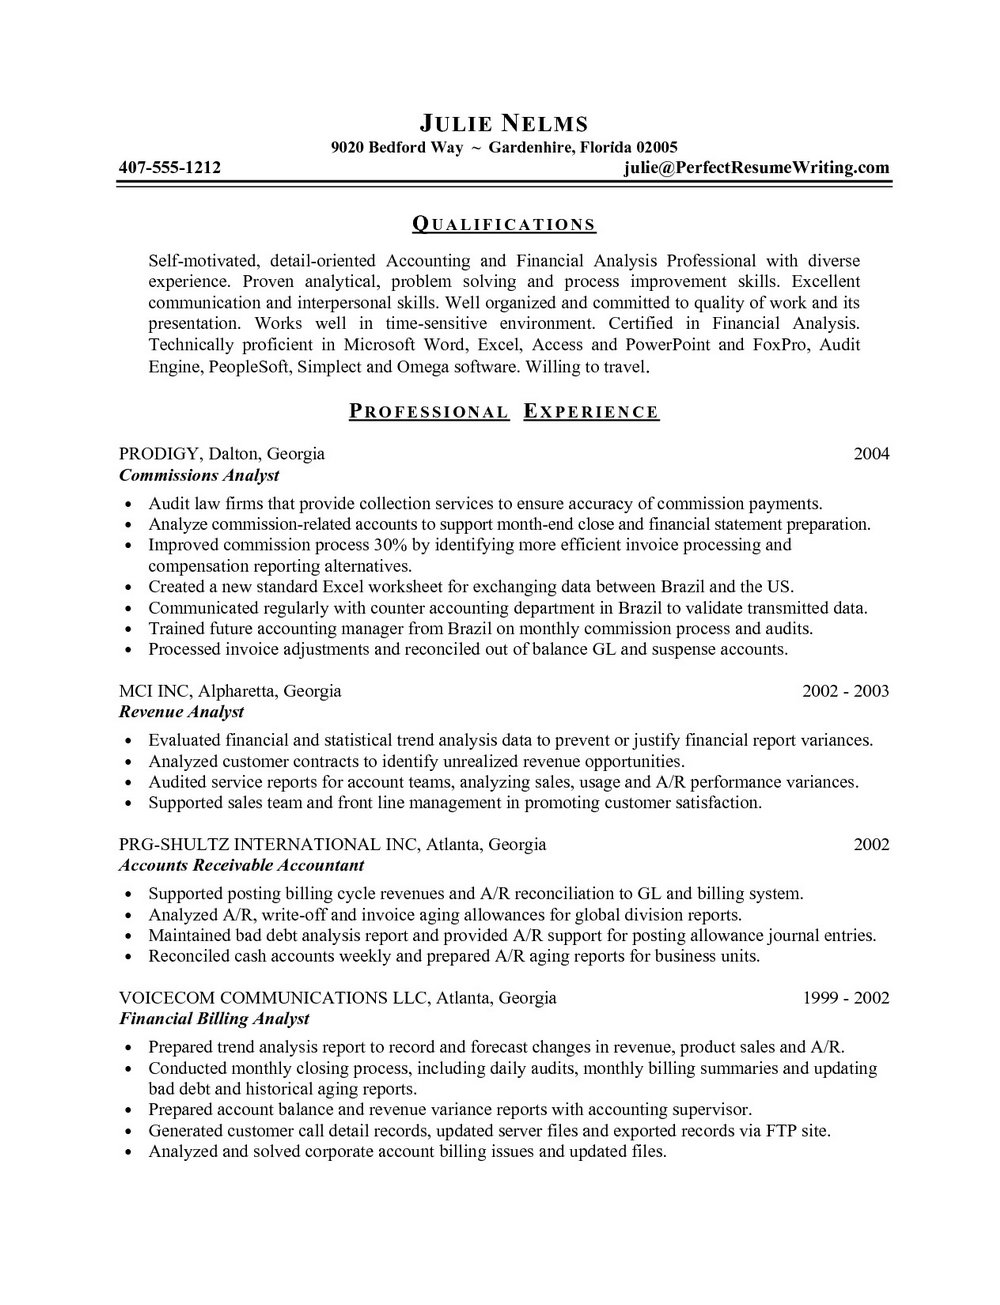 Resume Samples For Finance Professionals